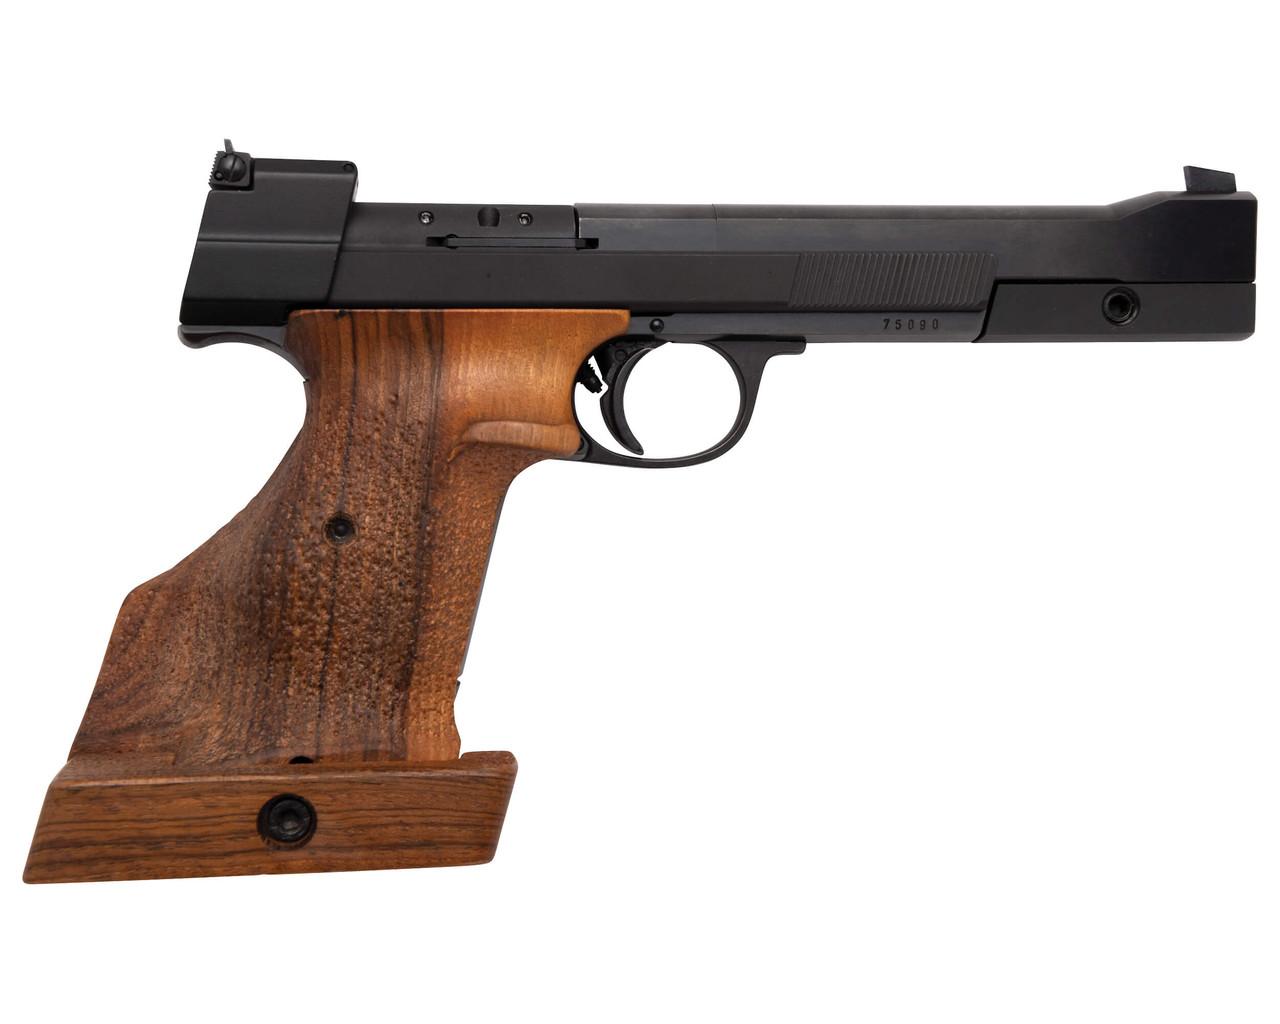 Hammerli 215 Target Pistol - sn 750xx